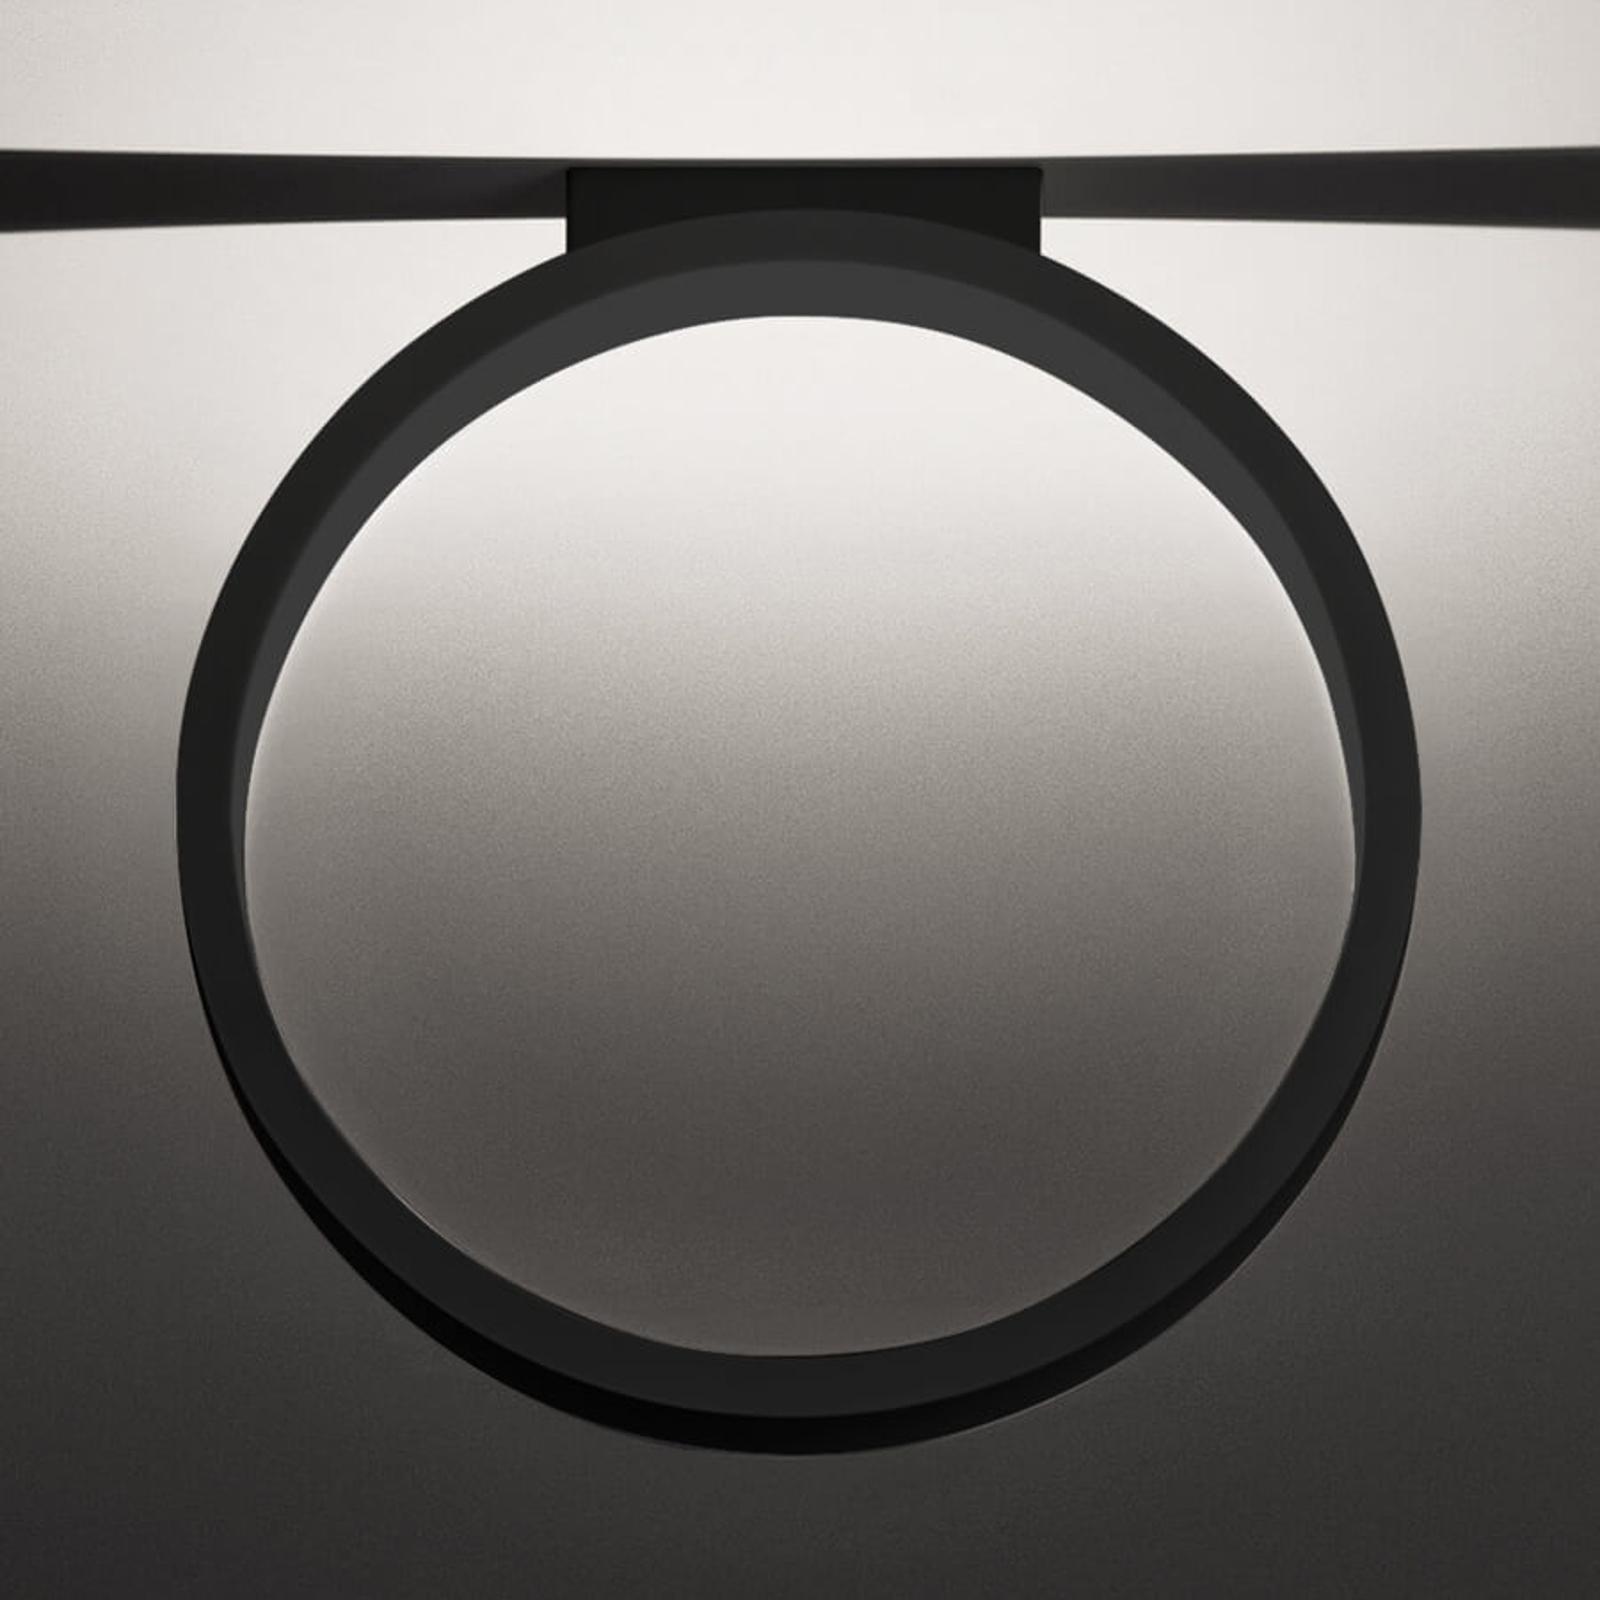 Cini&Nils Assolo - LED-Deckenleuchte schwarz 43 cm